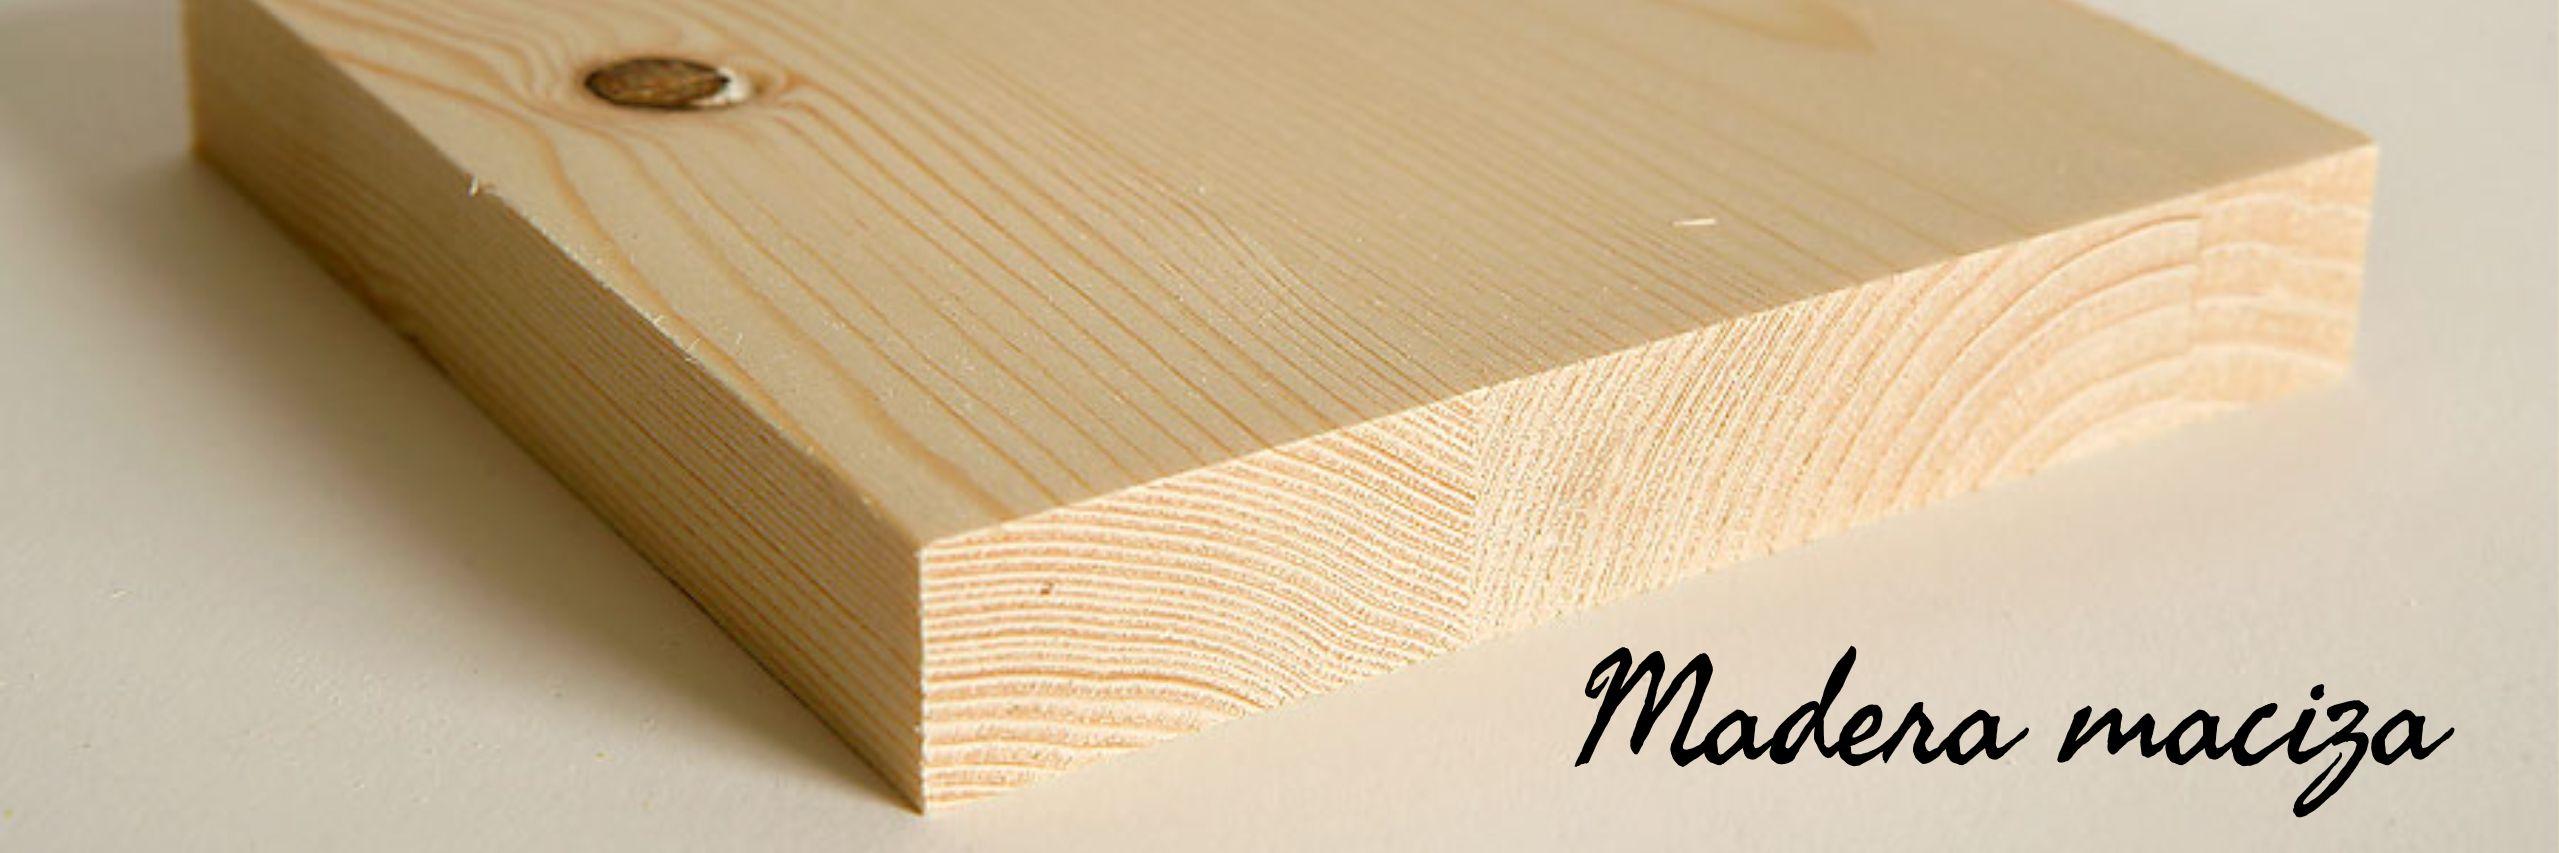 tablero de madera maciza de cabeceros.org